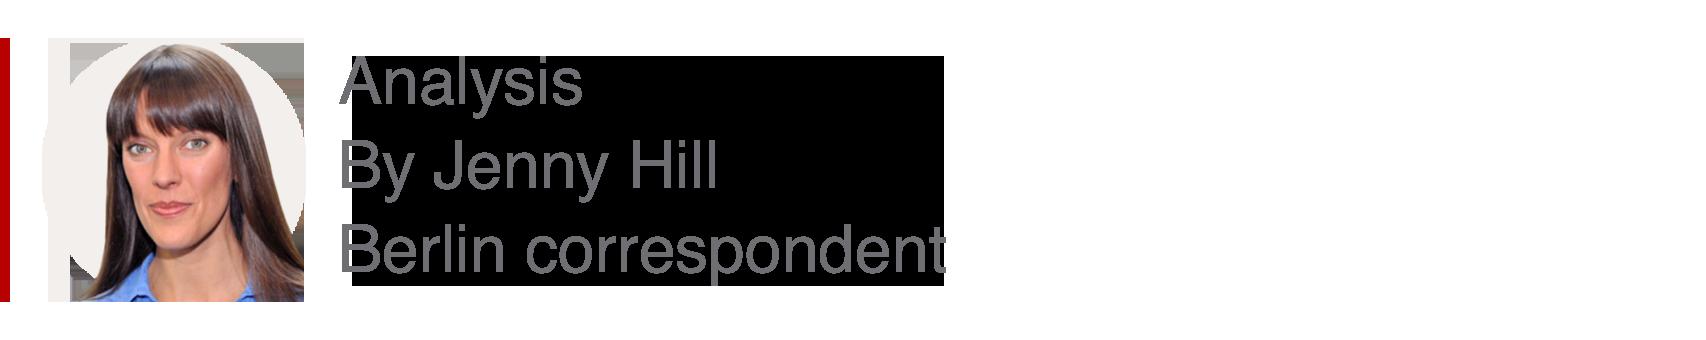 Analysis box by Jenny Hill, Berlin correspondent